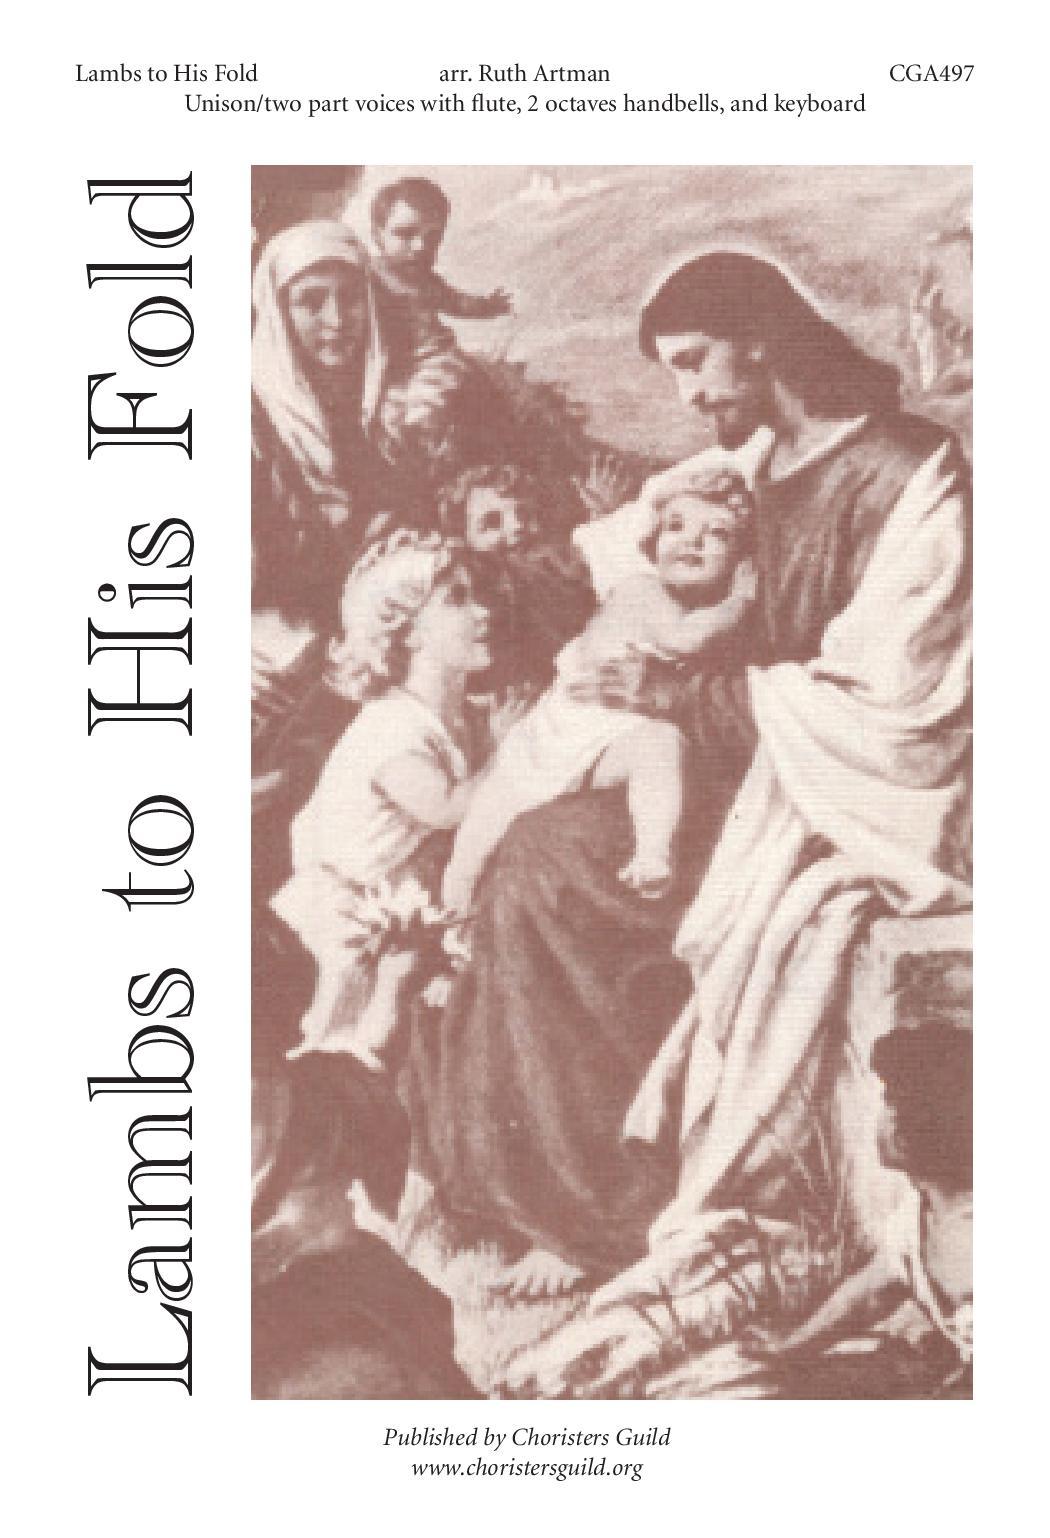 Lambs to His Fold